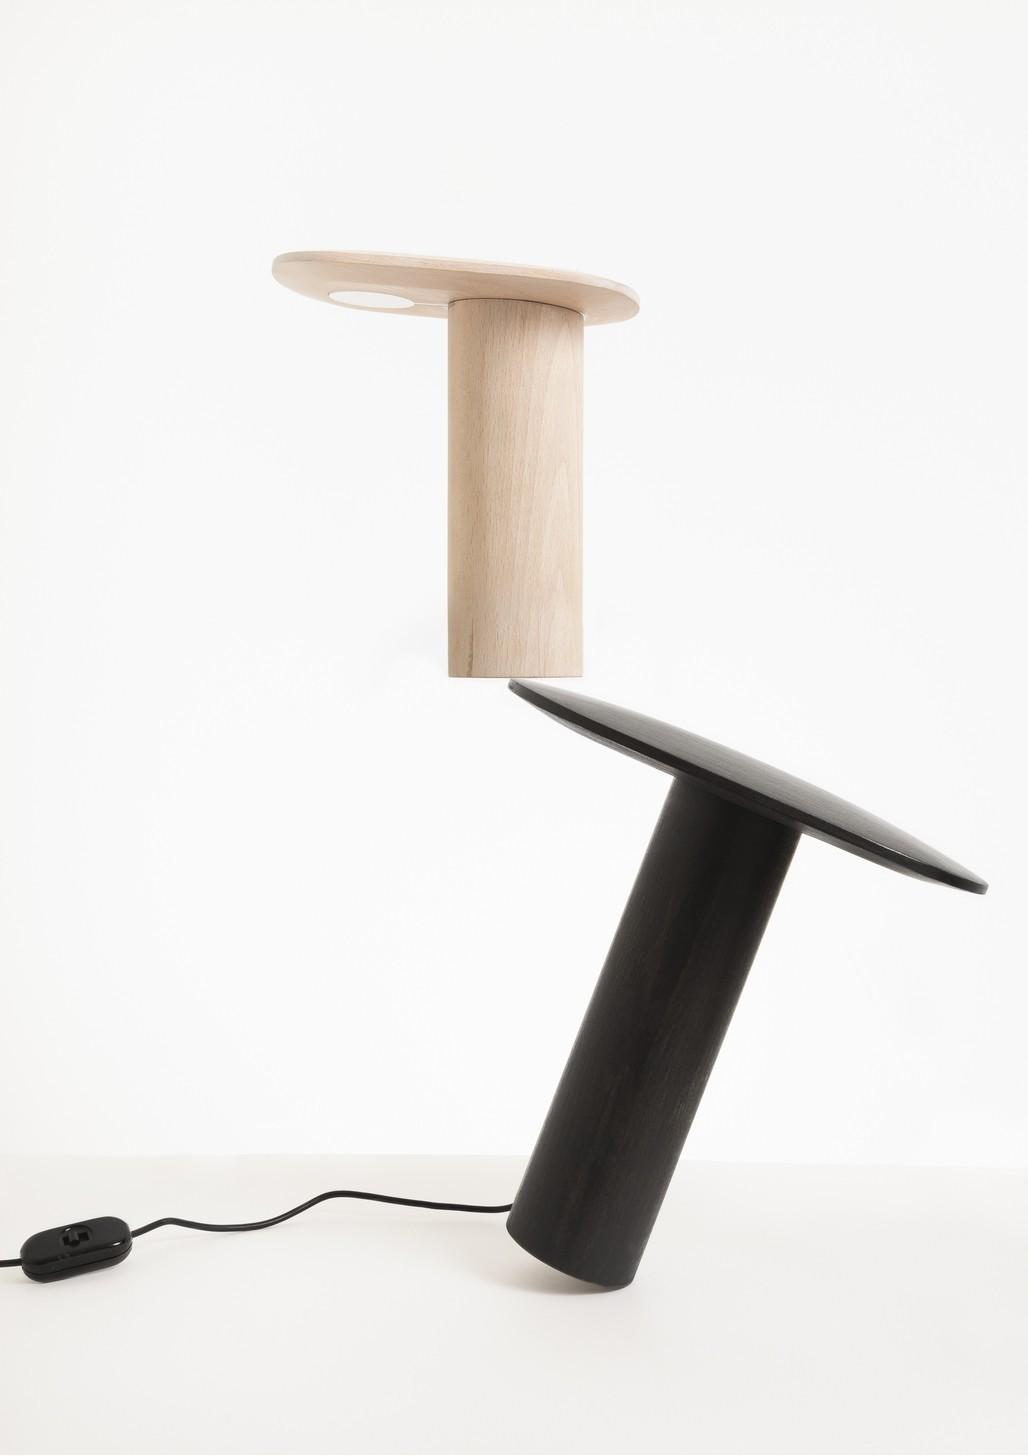 Petite lampe - Crane cover product